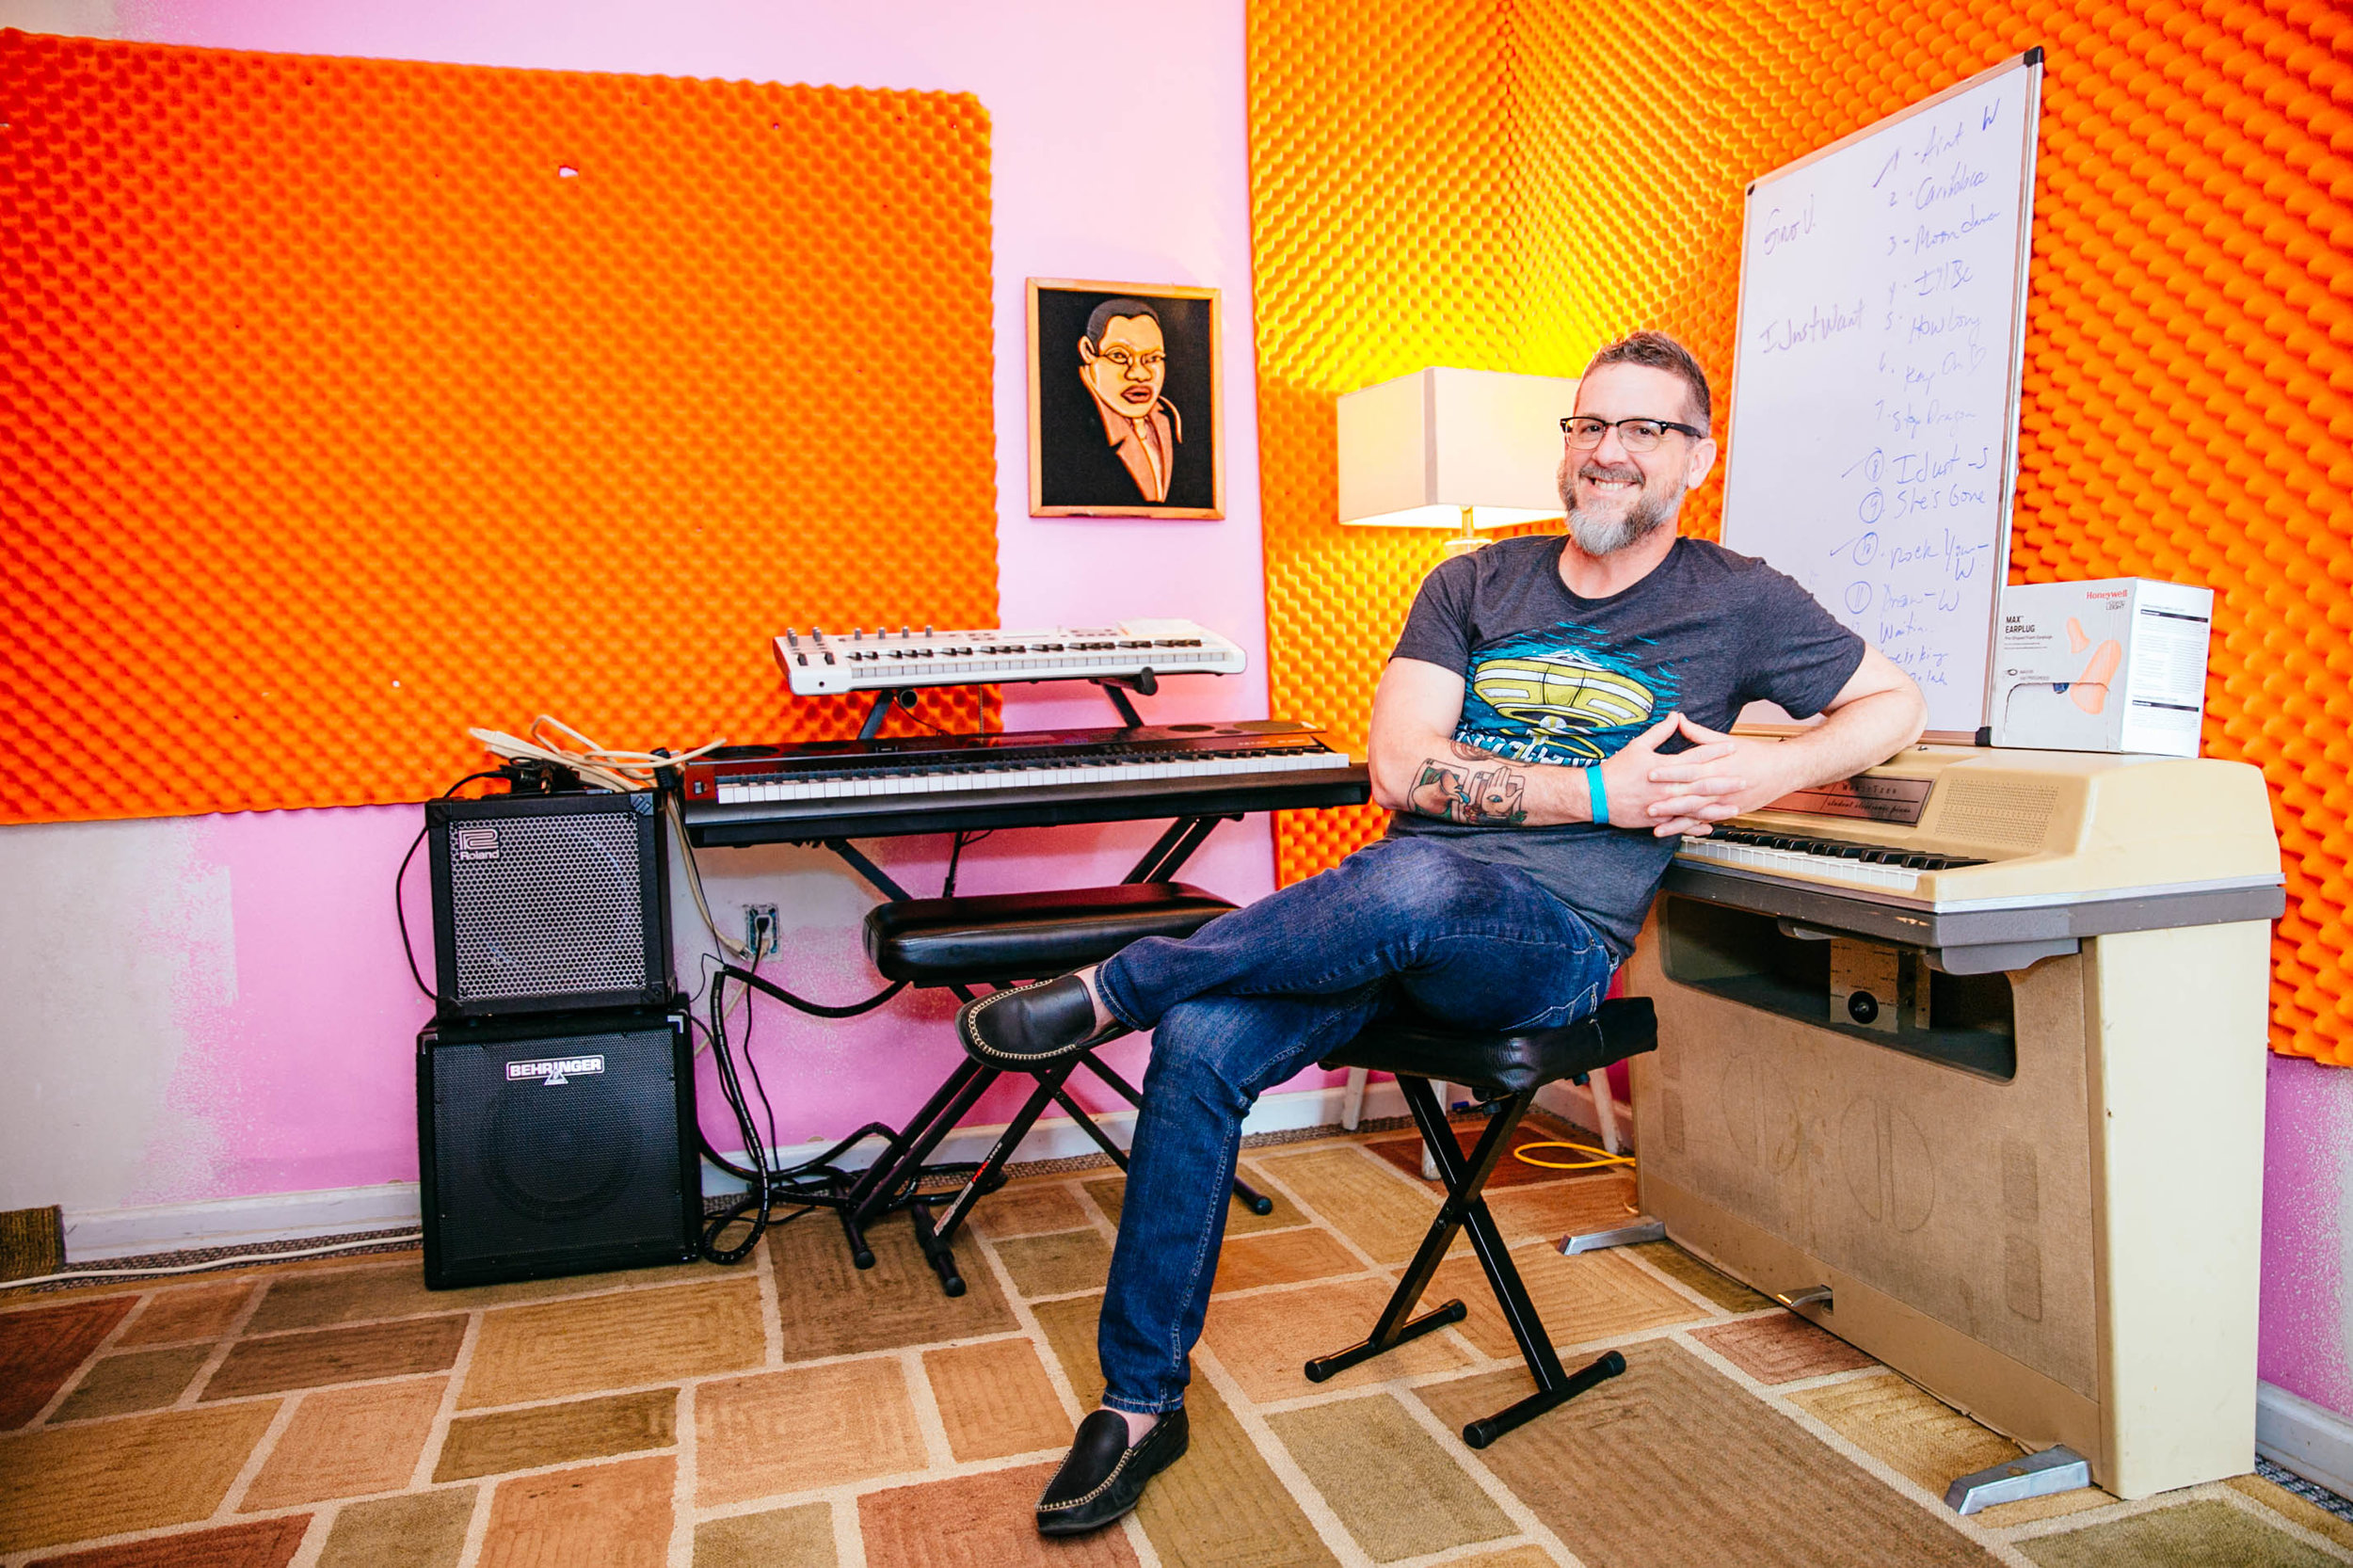 David Hinson of Adult Music Club